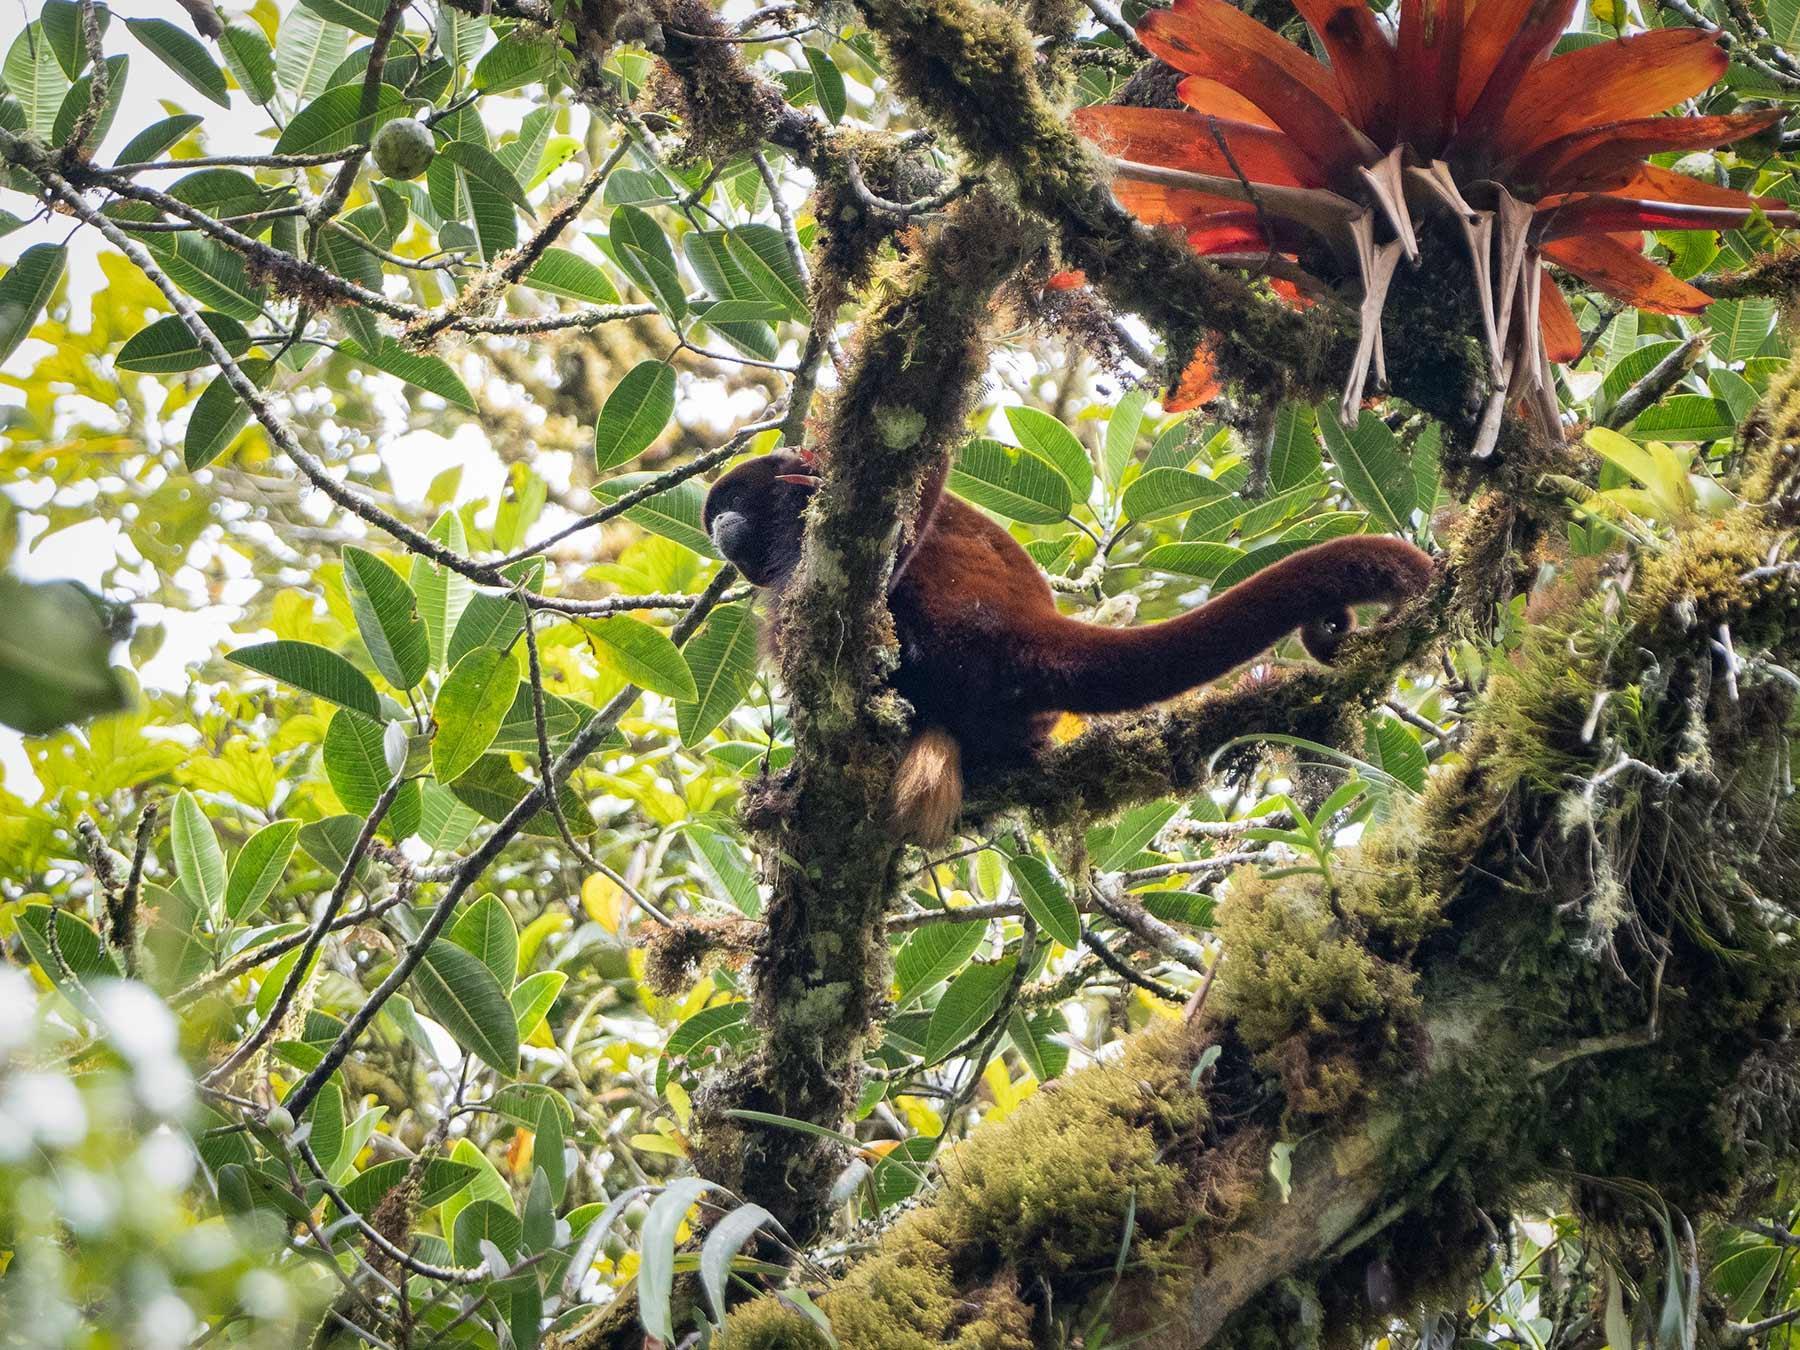 Yellow-tailed Wooly Monkey (Oreonax flavicauda), Peru